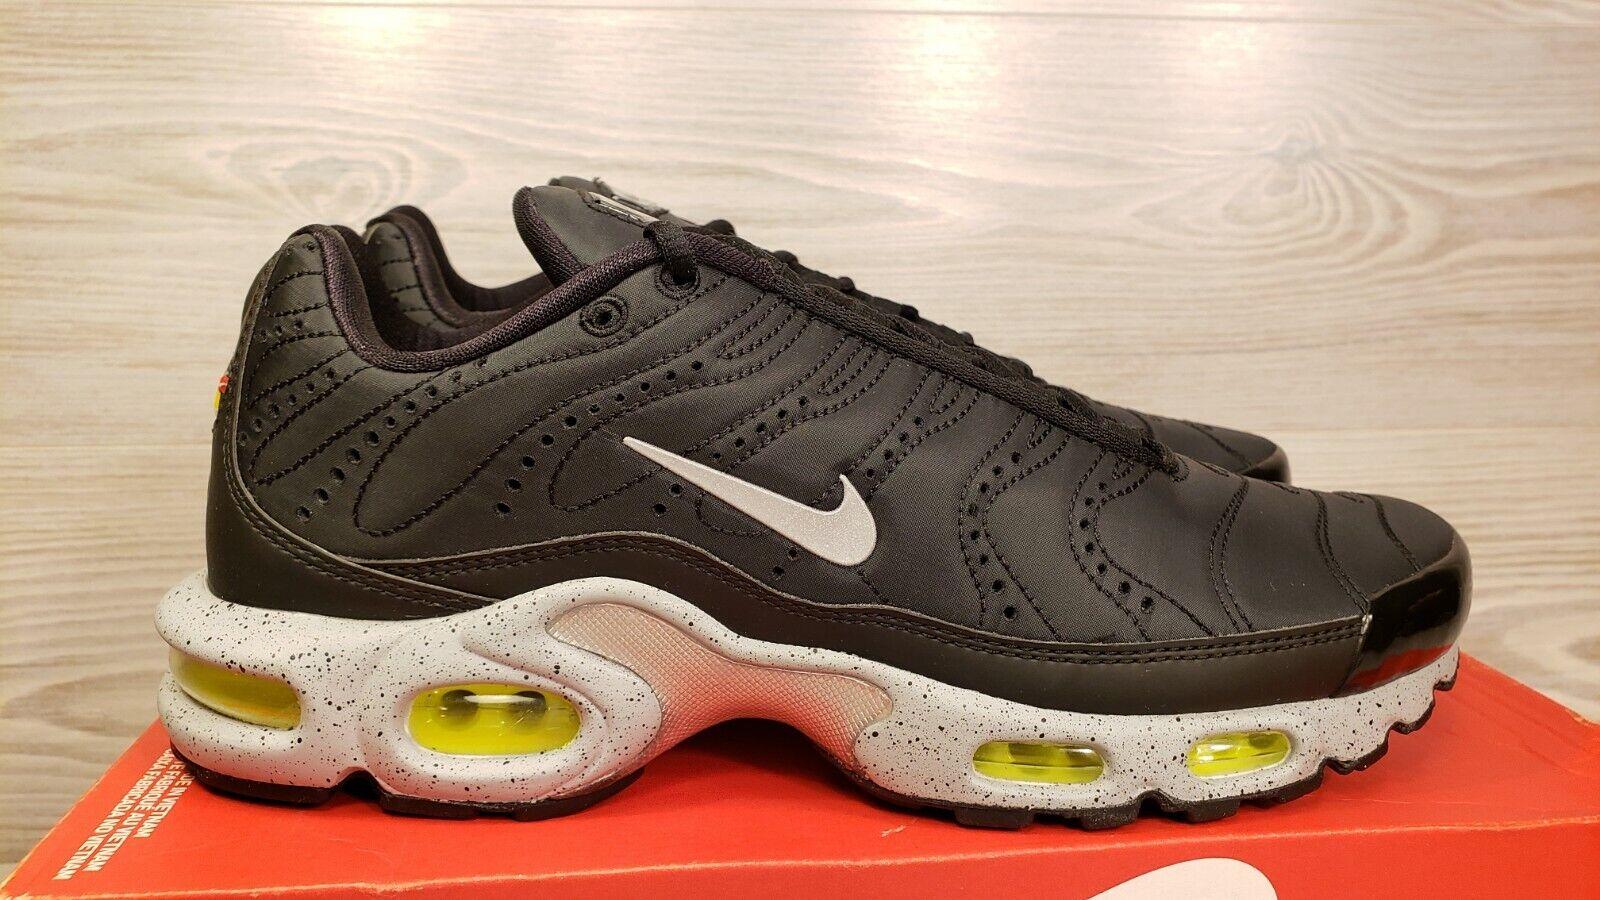 Plus Max Air Nike PRM Black 9.5 Size 815994 003 Silver Grey